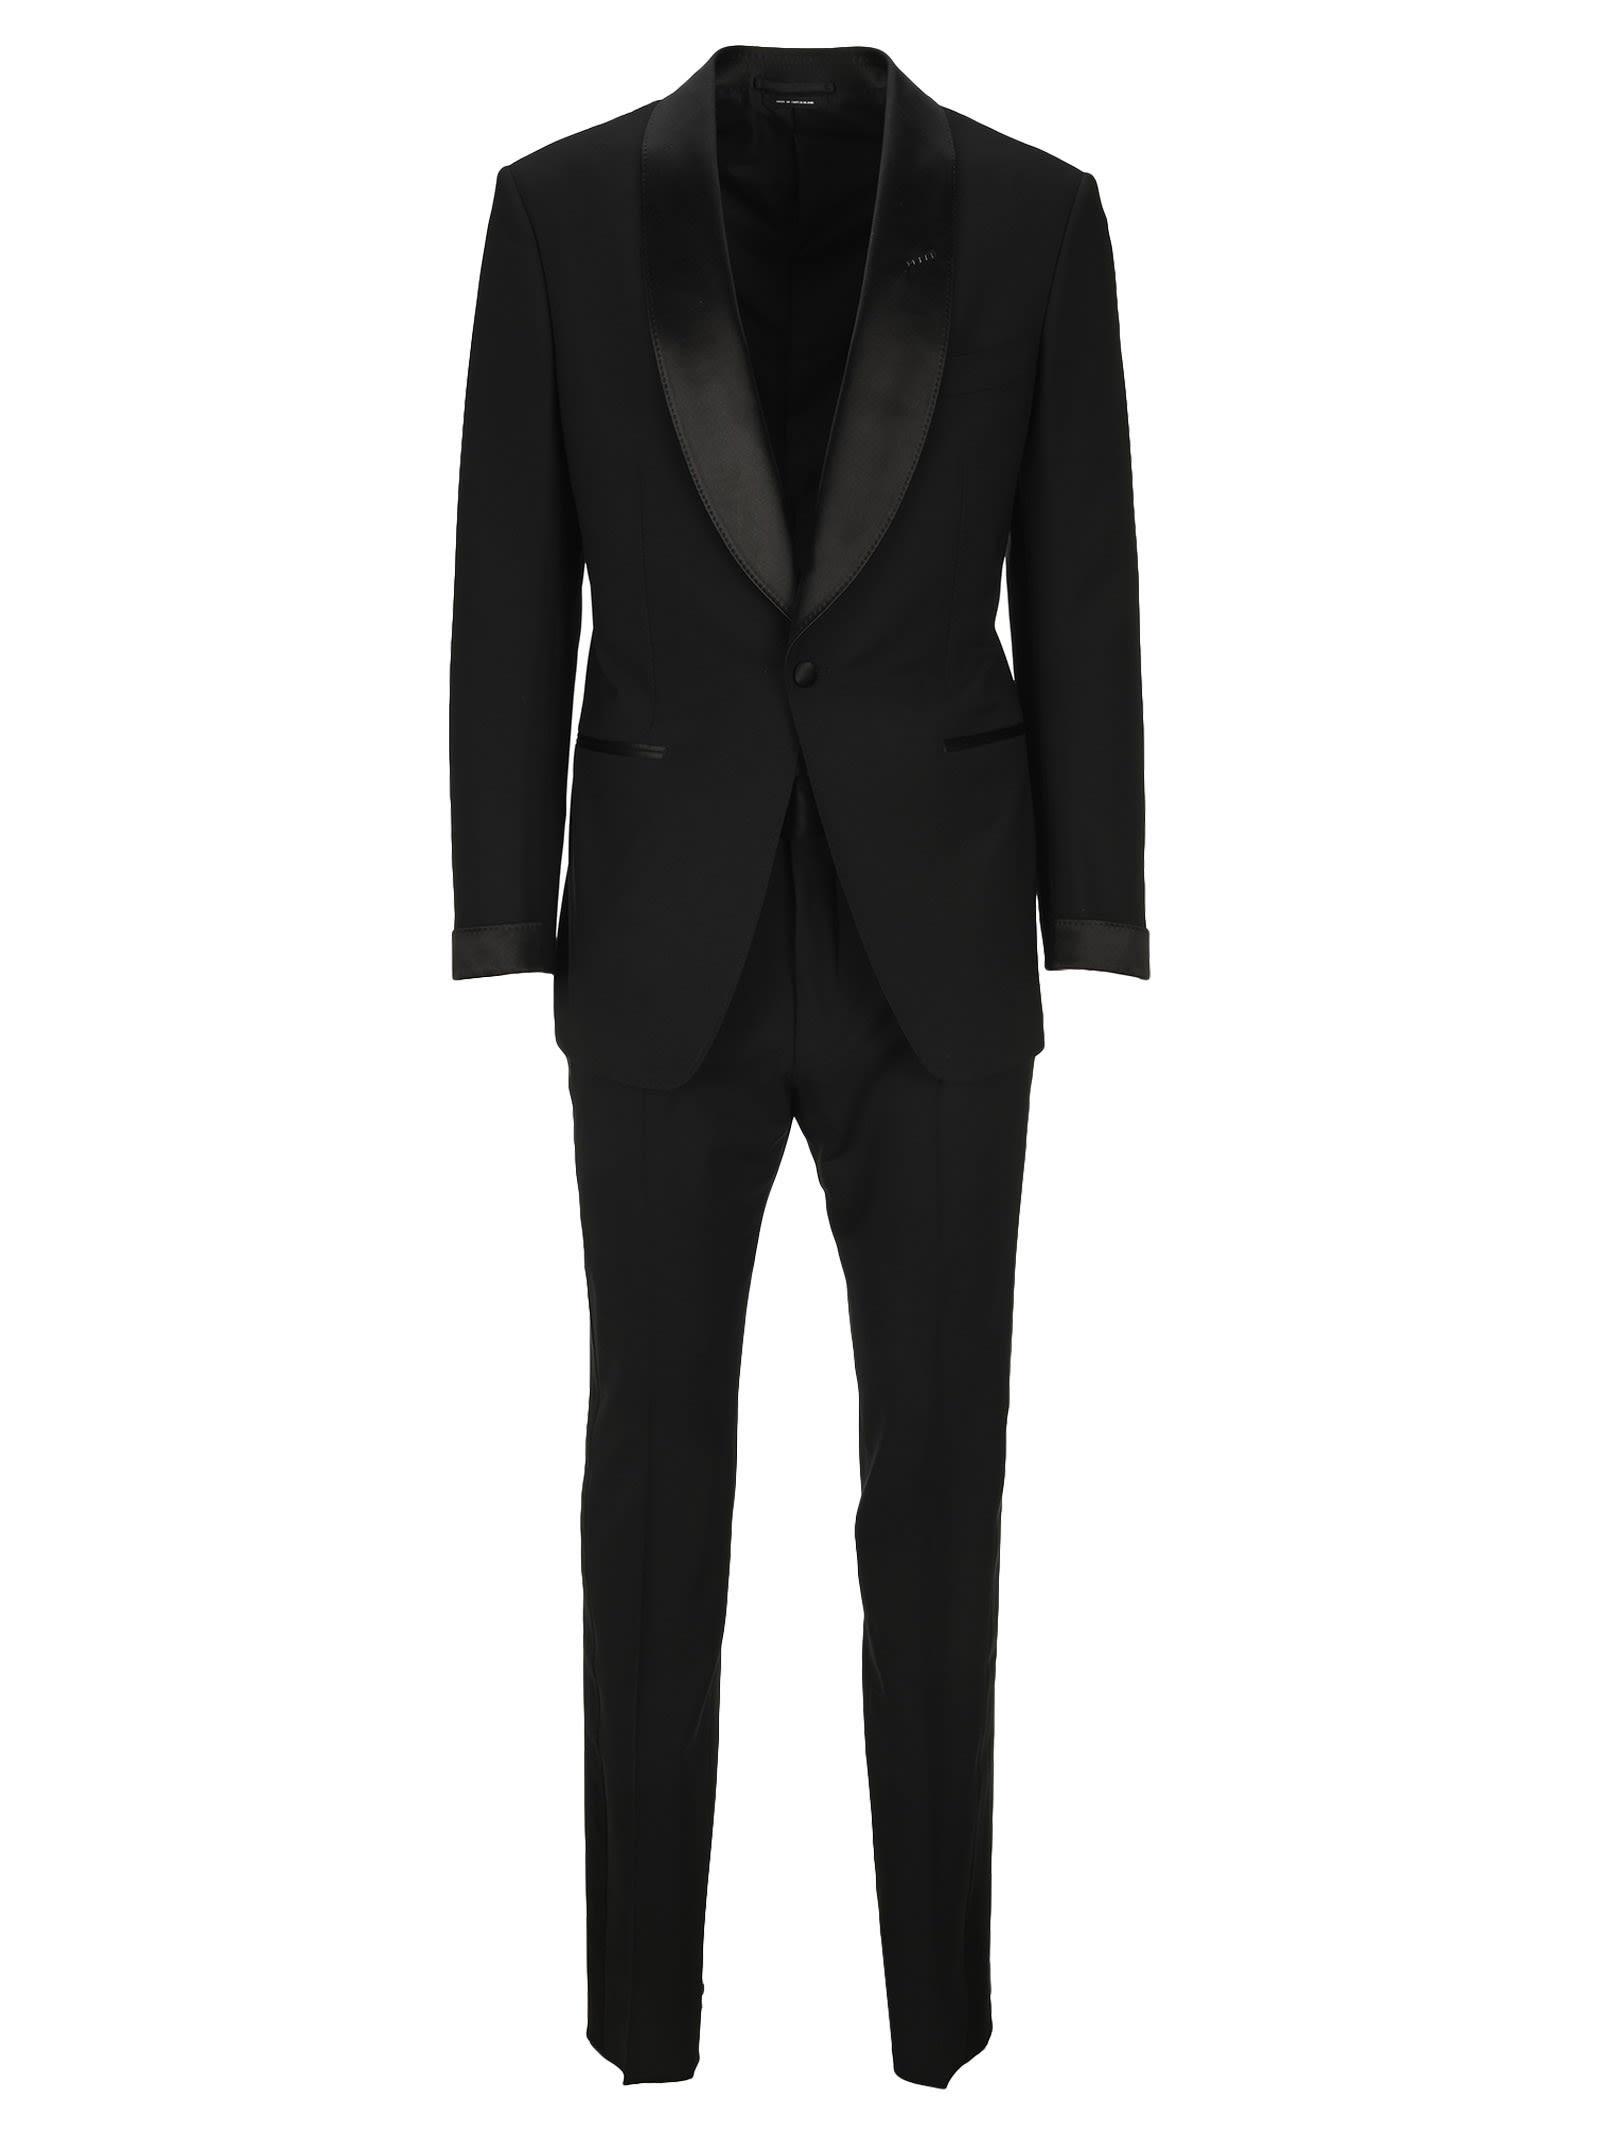 Tom Ford Tuxedo Suit